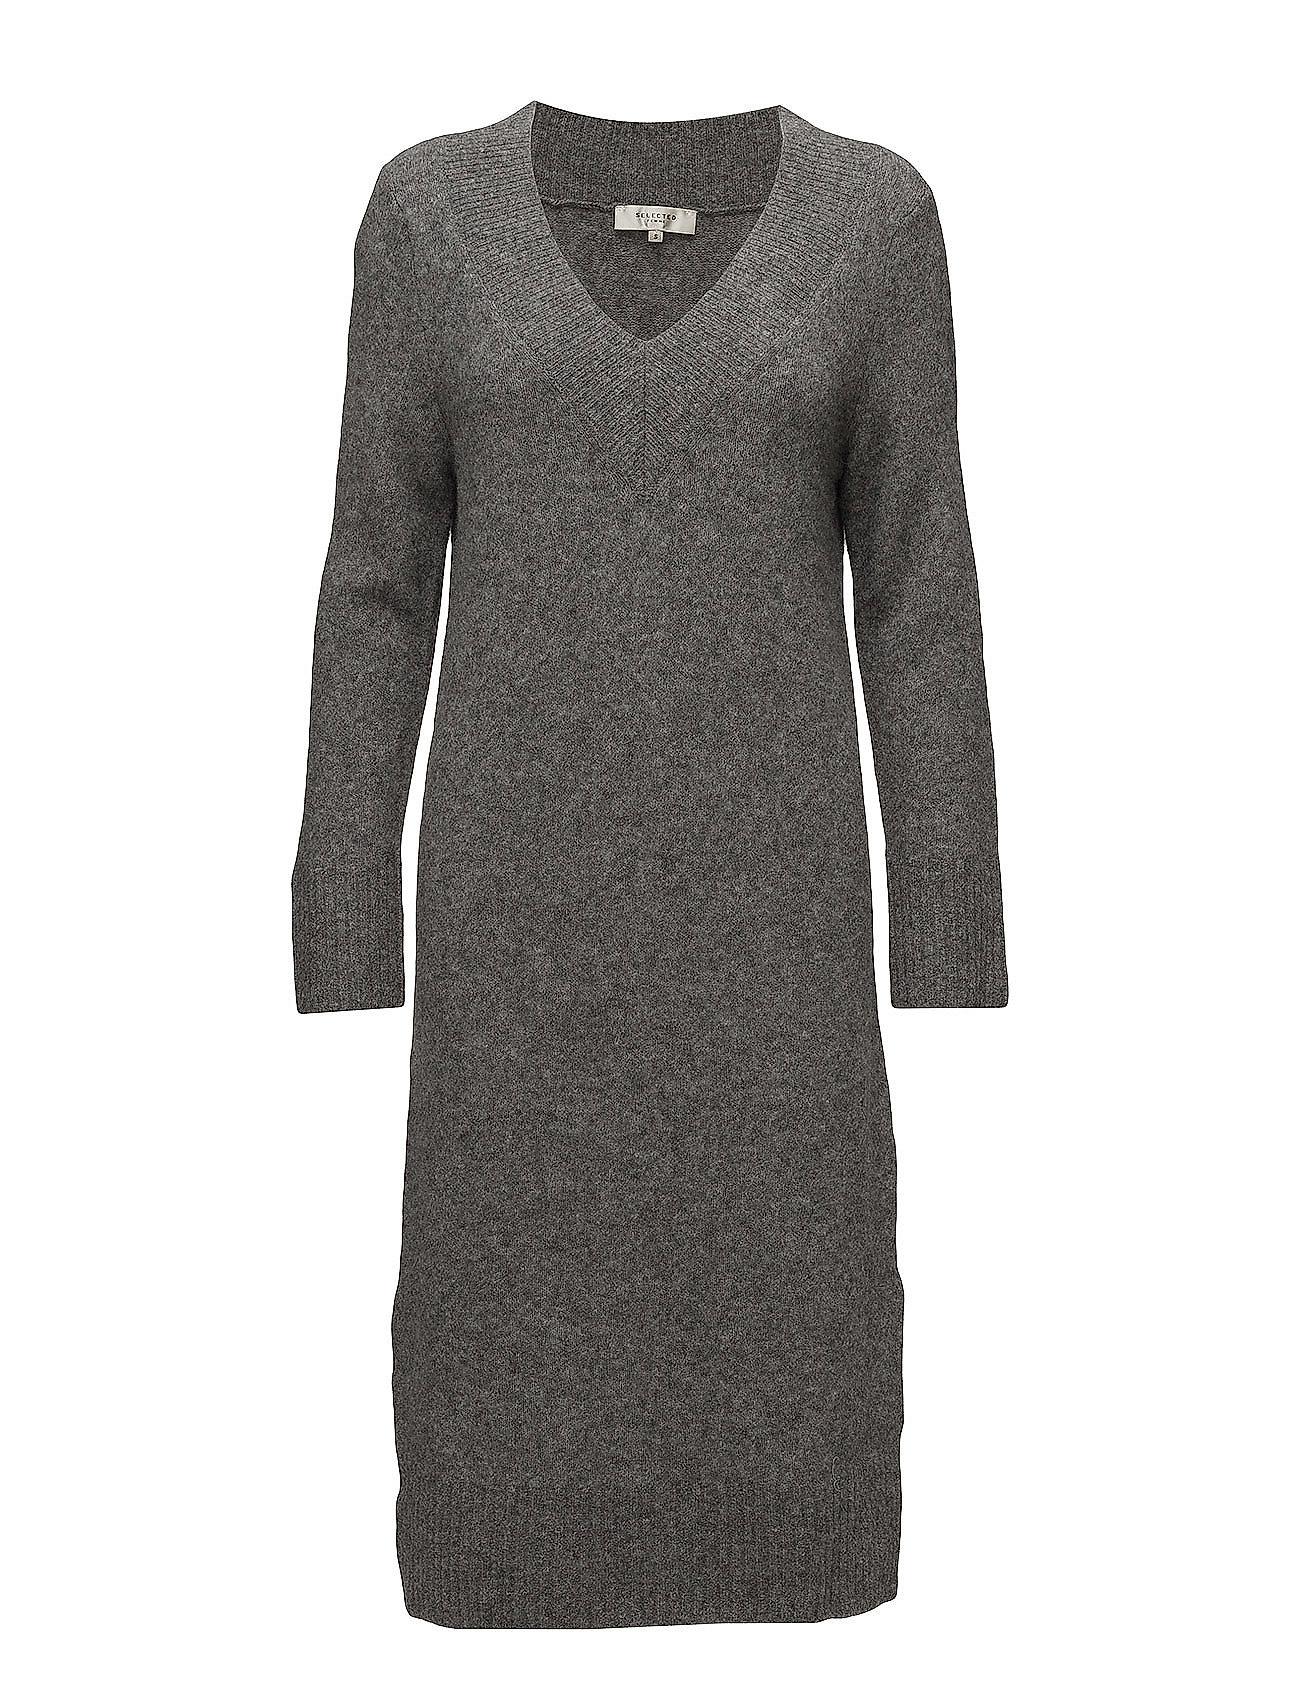 Sfjamia Ls Knit Deep V-Neck Dress Selected Femme Dresses thumbnail